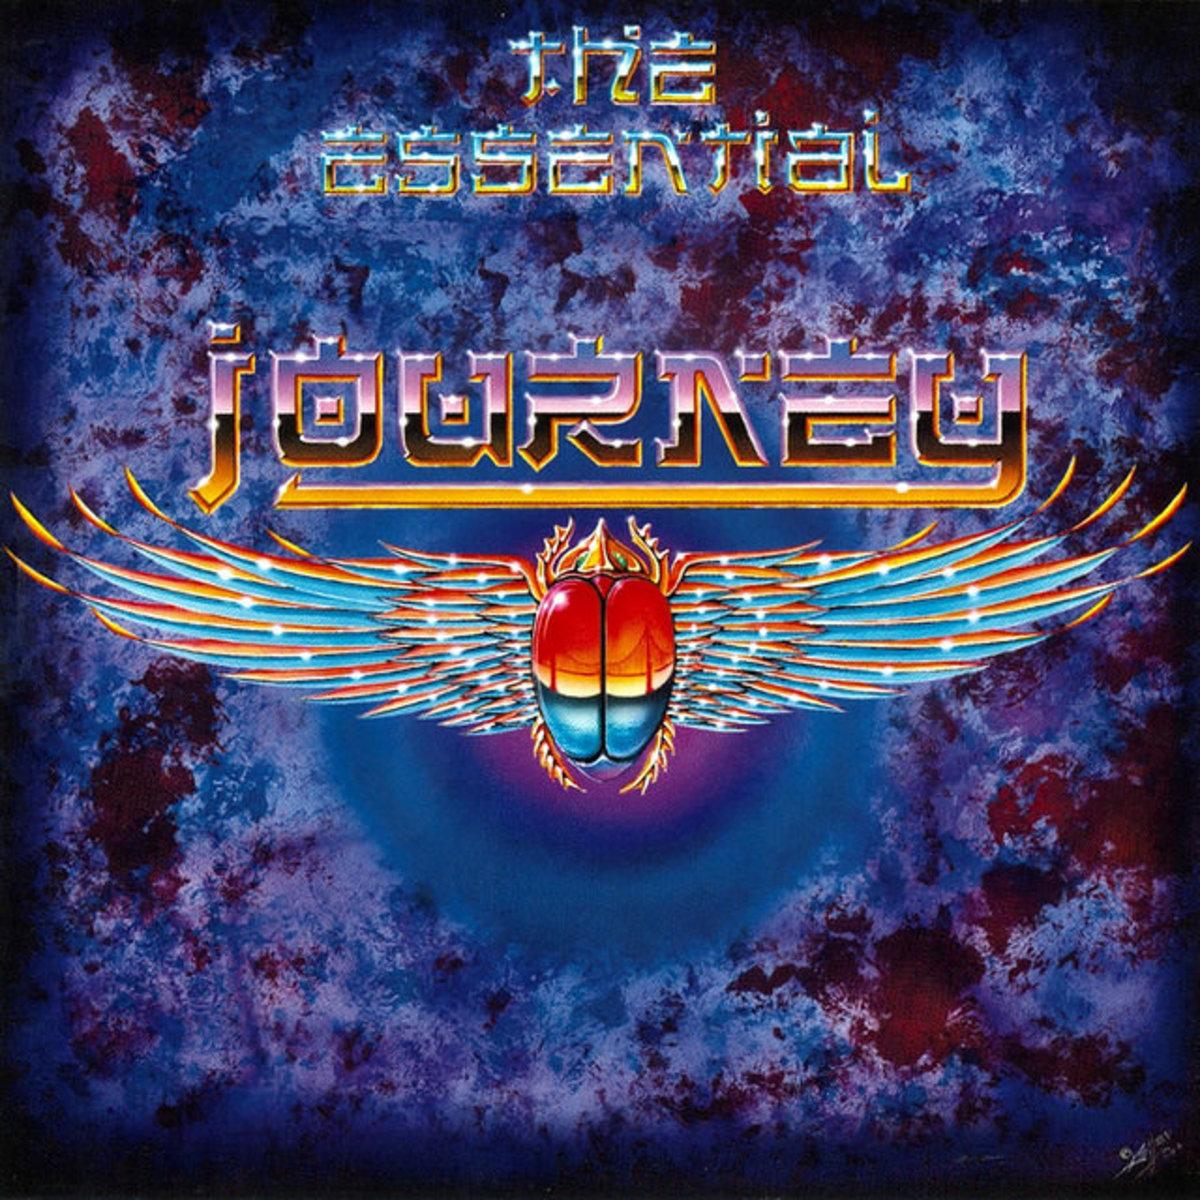 "Journey ""The Essentials"" Columbia, LegacyColumbia, C2K 86080 2 CD Set US Pressing (2001) Album Cover Art by Alton Kelley"